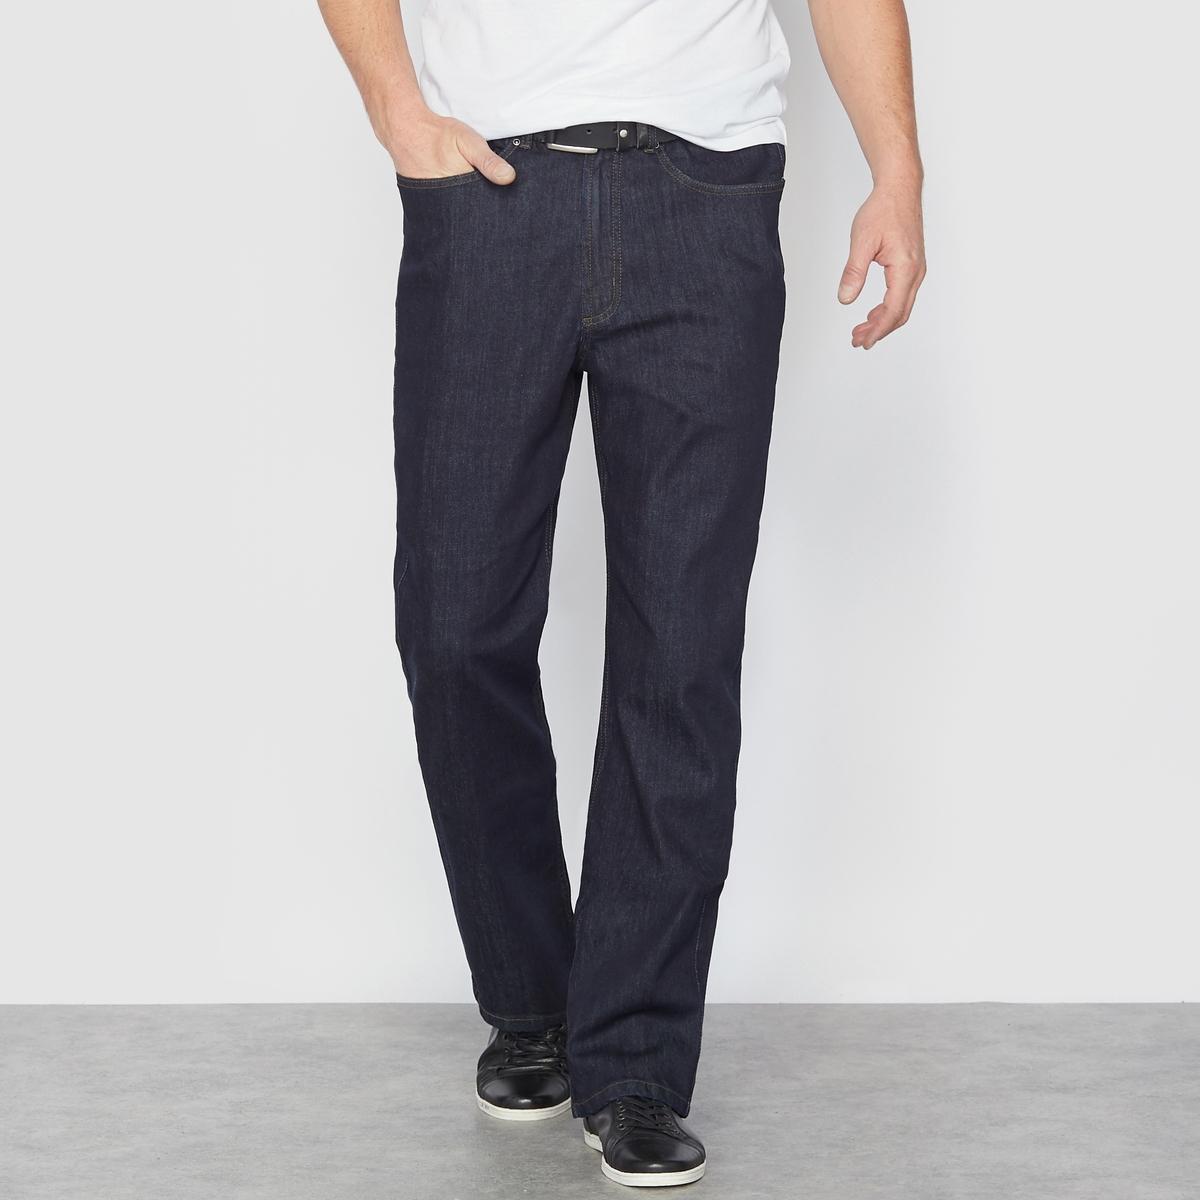 Jeans stretch standard, cós elástico, comp. 2